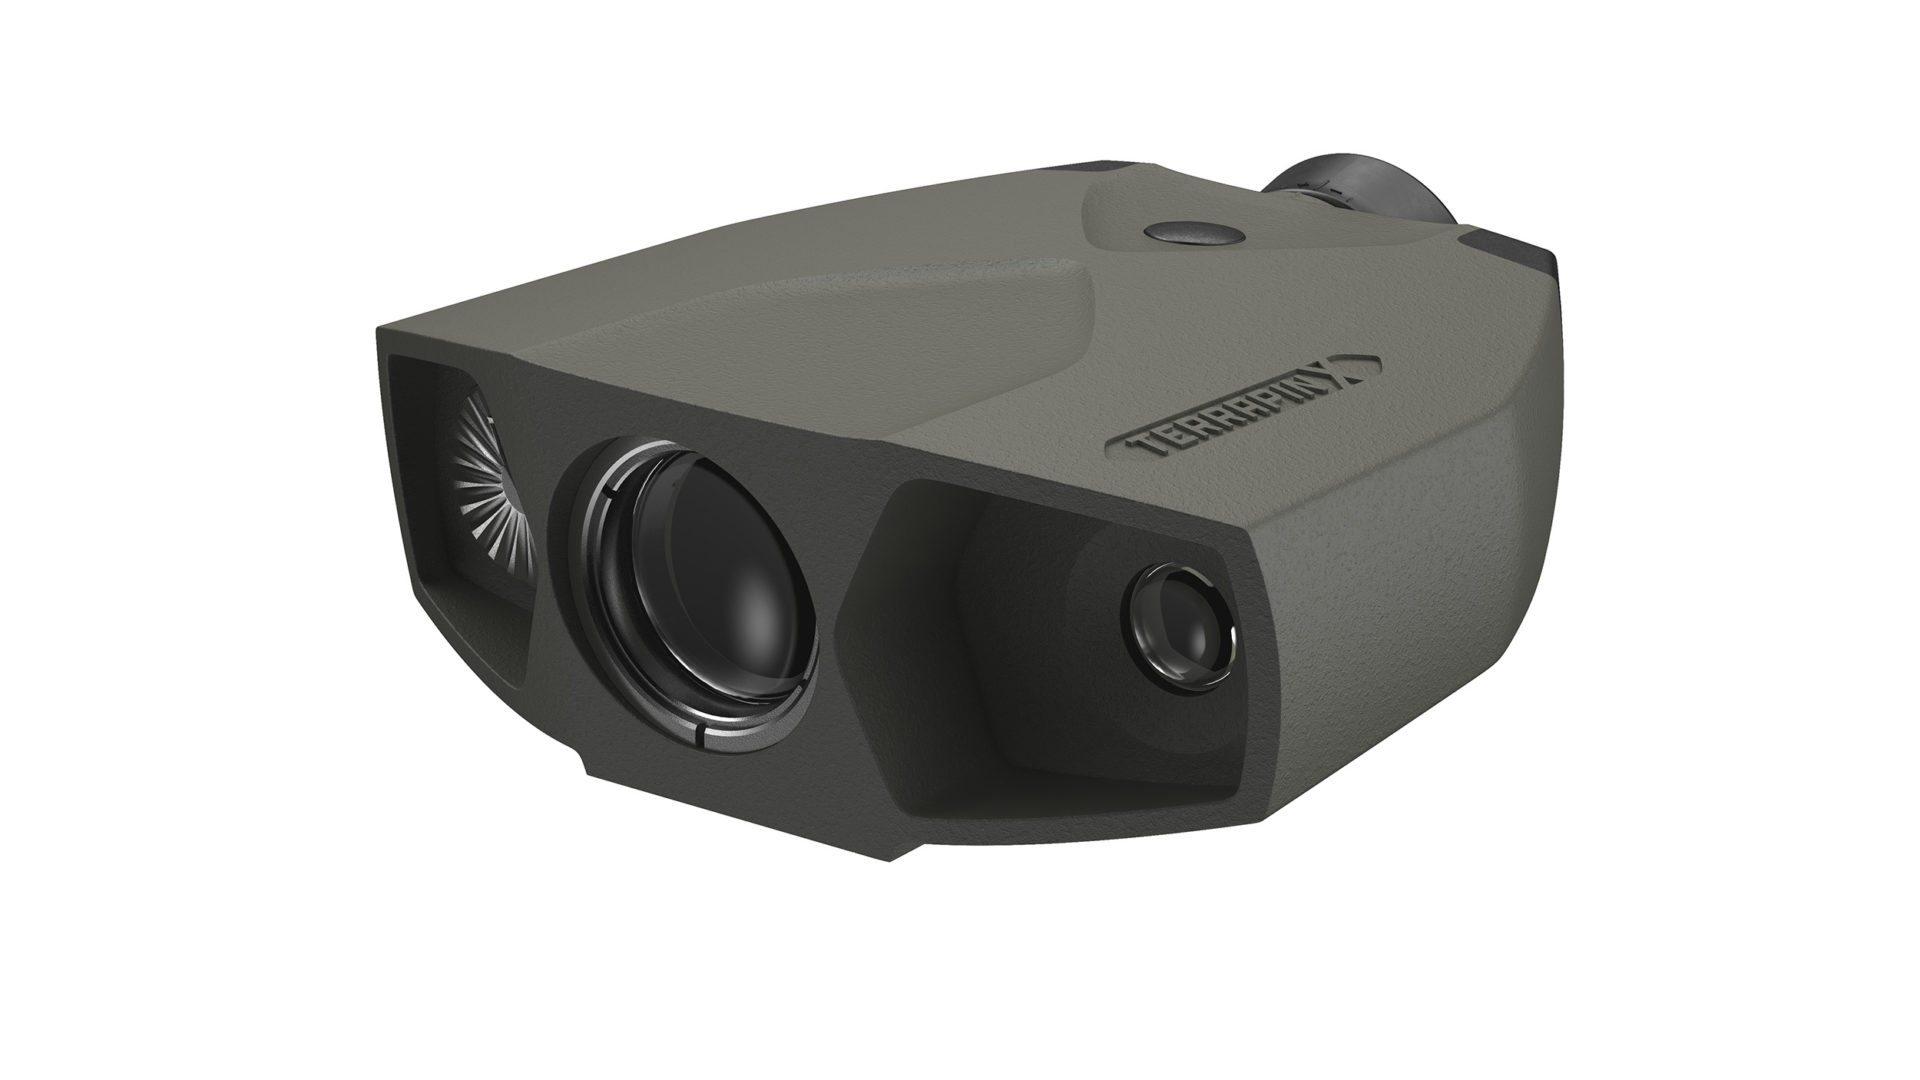 Laser Entfernungsmesser Mit Stativ : Iea vectronix terrapinx